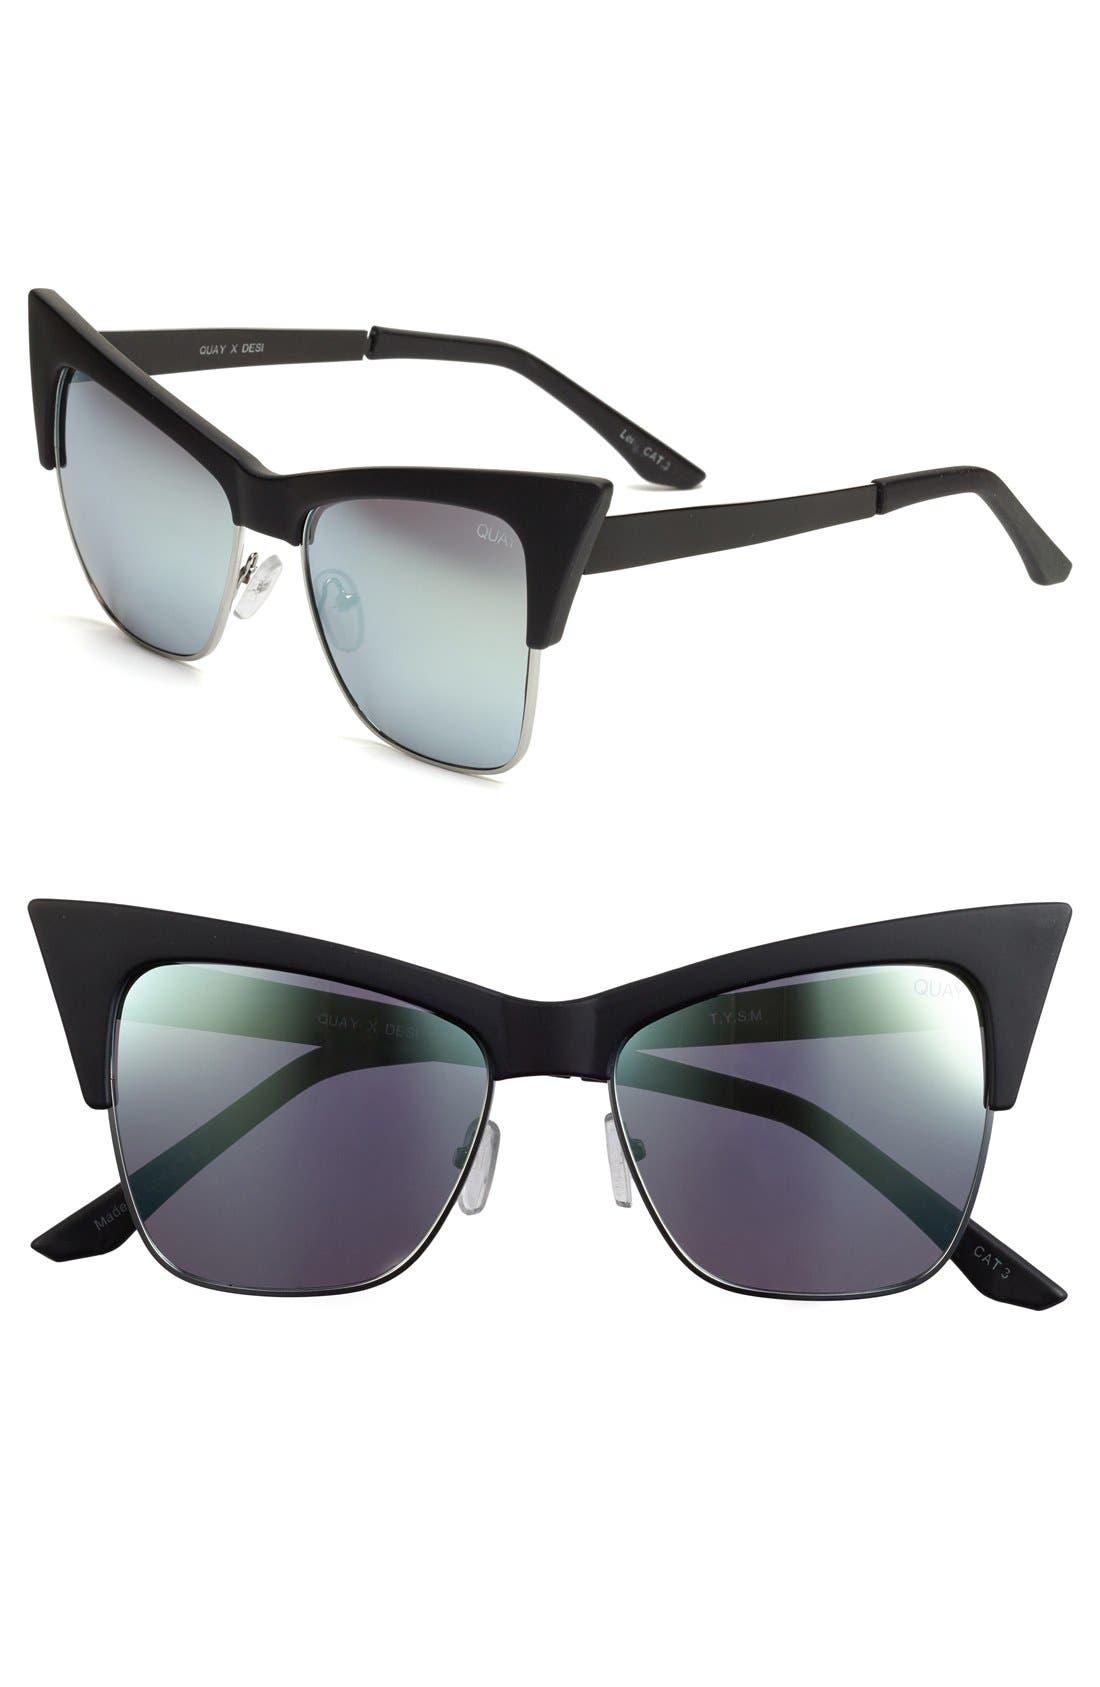 Main Image - Quay Australia x Desi Perkins 'TYSM' 55mm Cat Eye Sunglasses